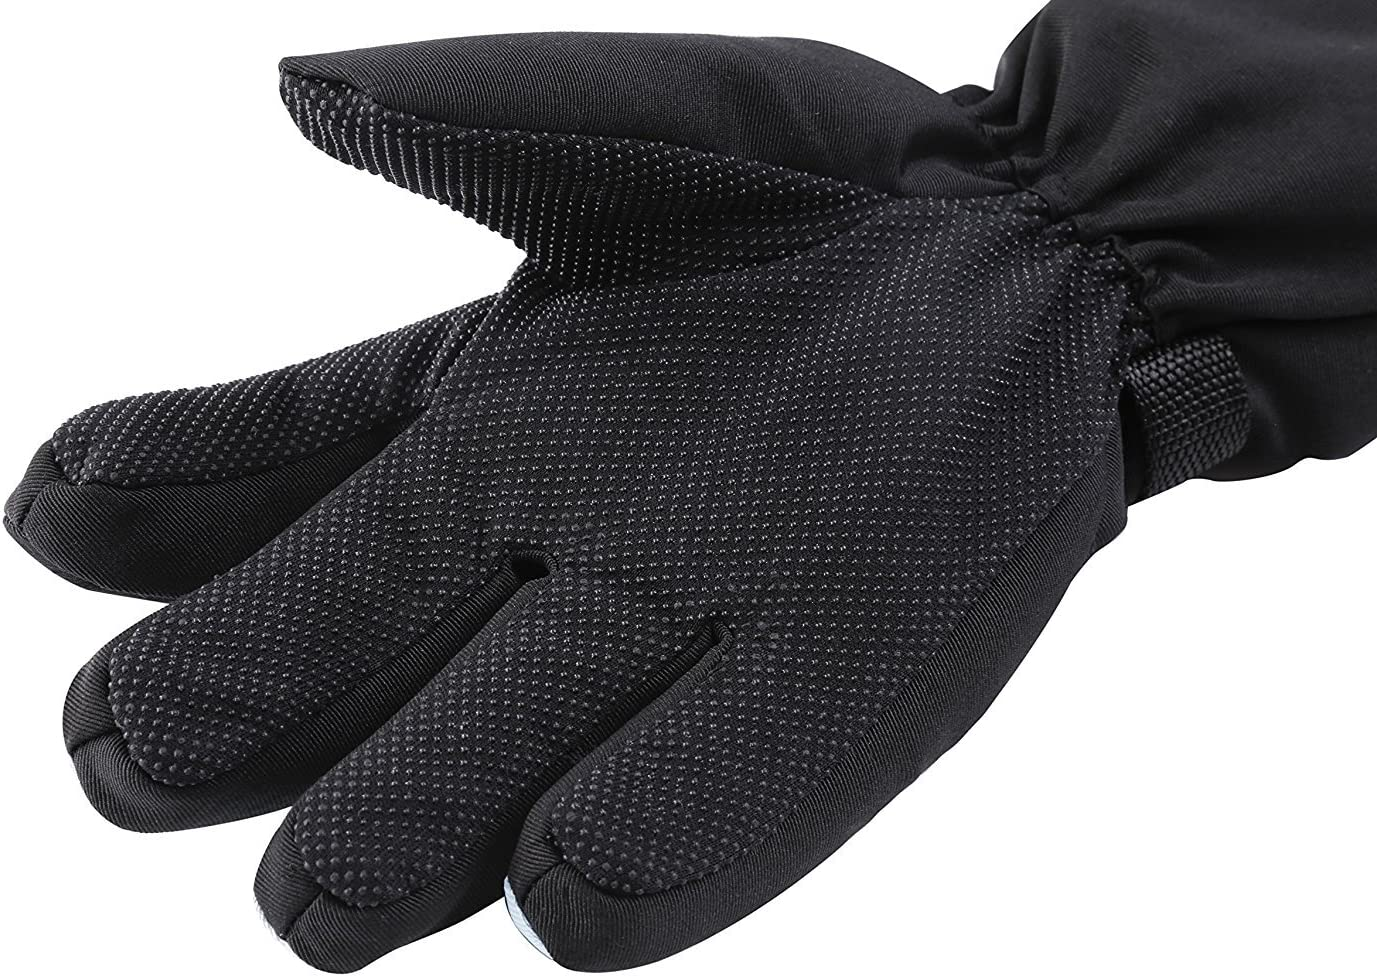 Runtlly Womens Outdoor Skiing Gloves Winter Warm Gloves Full Finger Waterproof Gloves Athletic Gloves